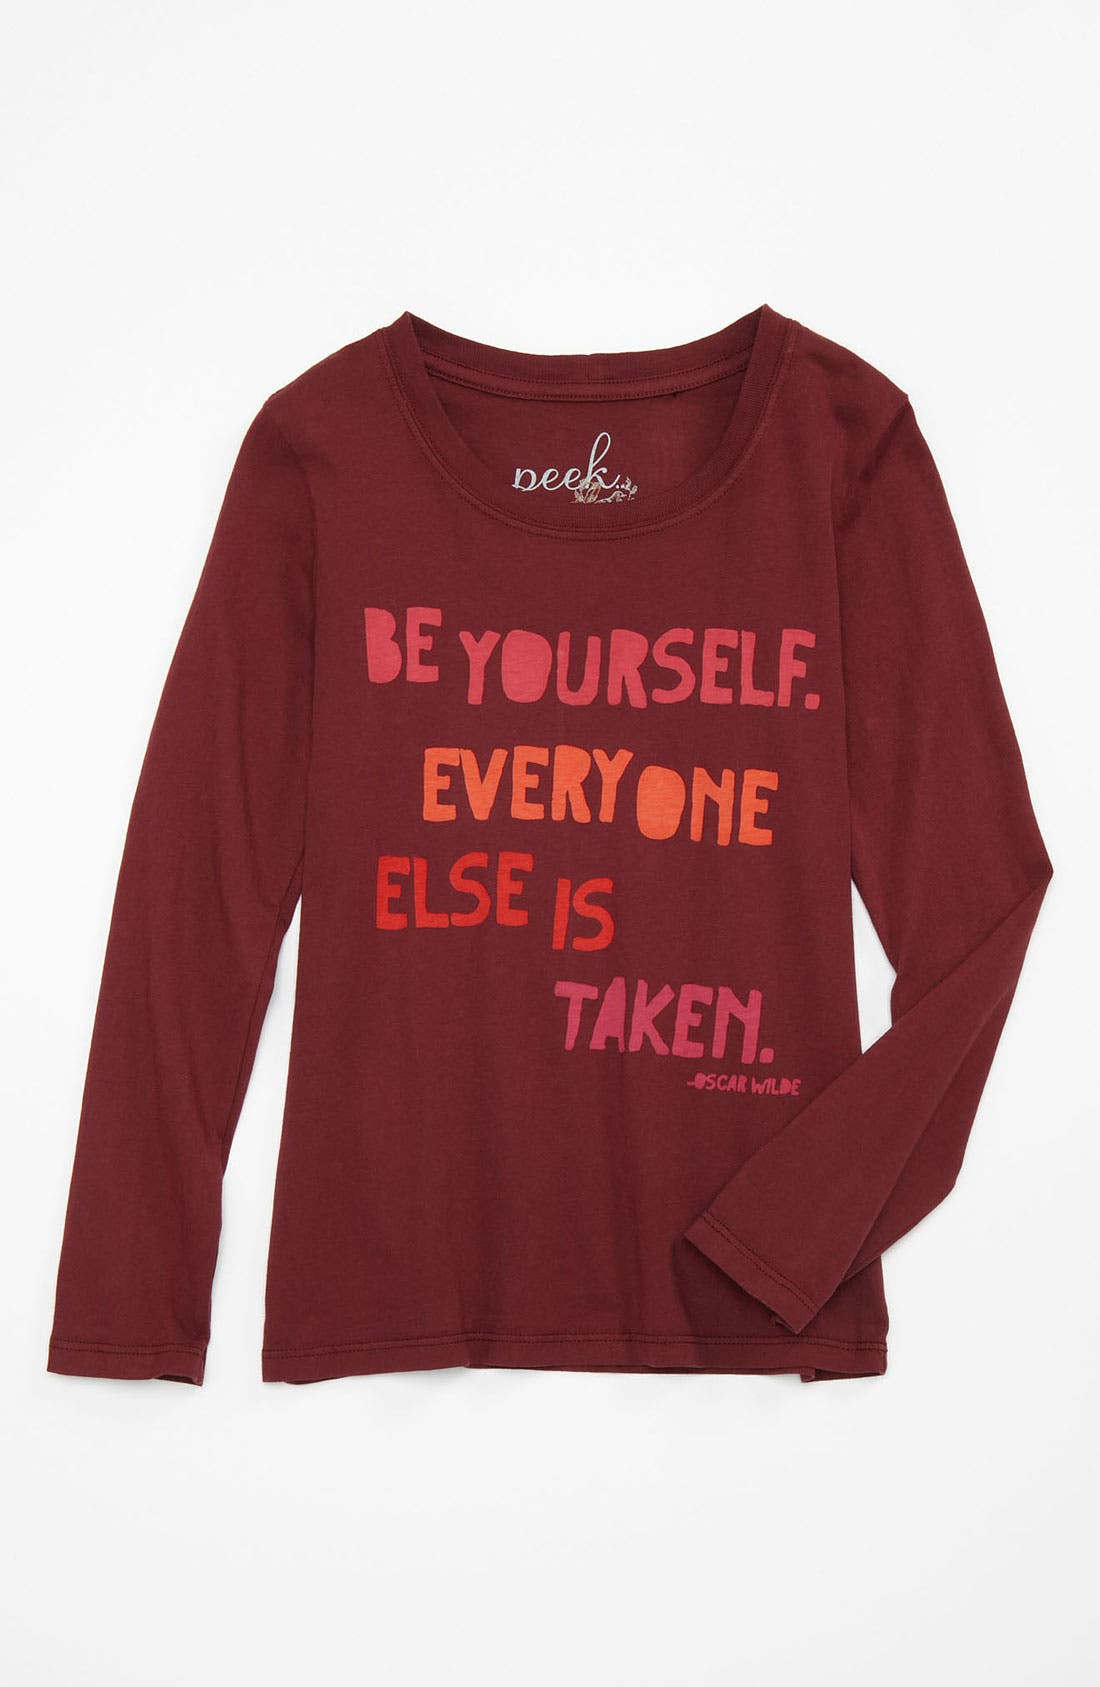 Alternate Image 1 Selected - Peek 'Be Yourself' Tee (Toddler, Little Girls & Big Girls)